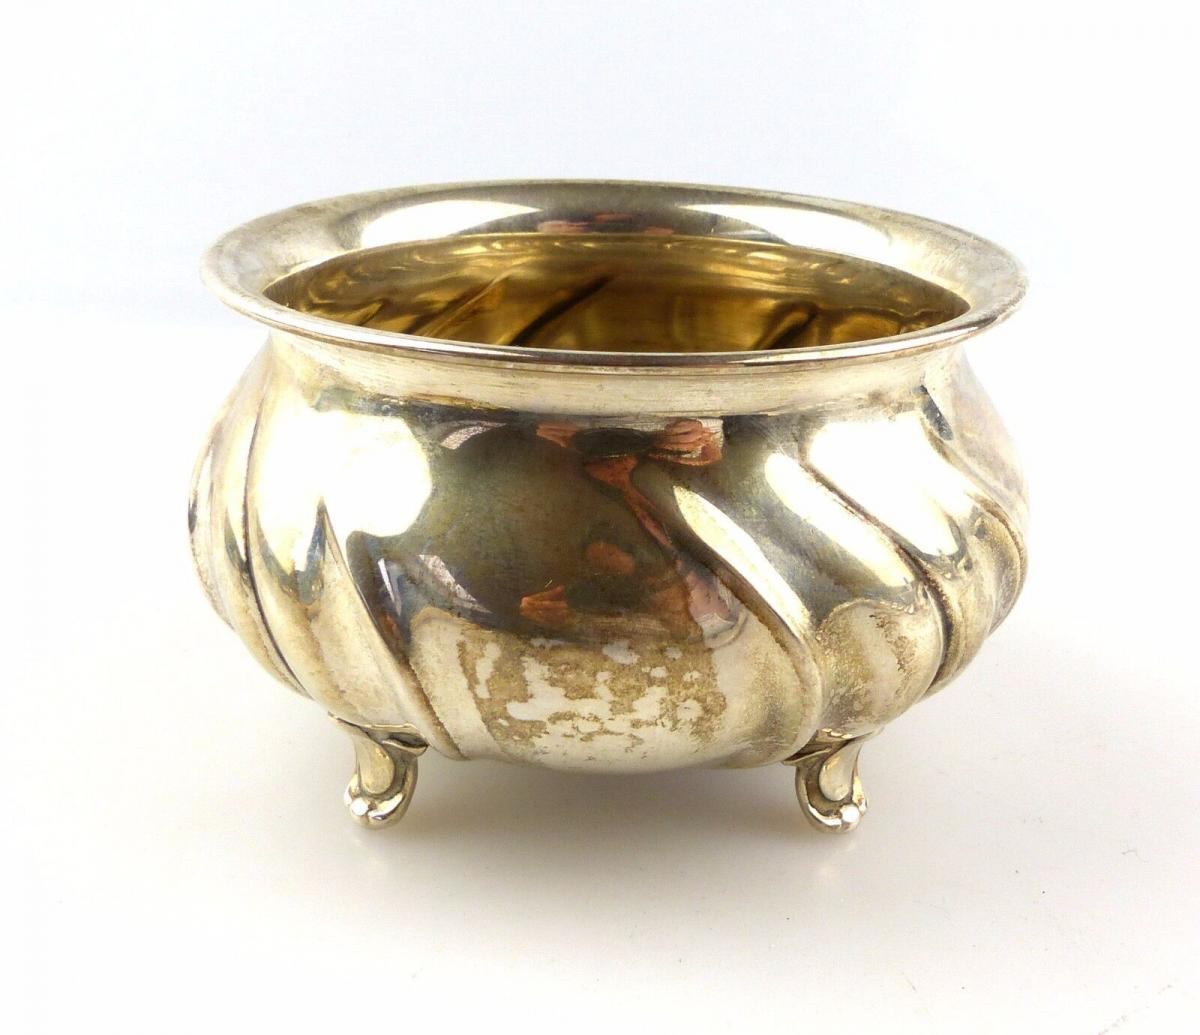 #e4933 Wilkens Zuckerdose Zuckerschale aus 835er Silber nach Dresdener Hofmuster